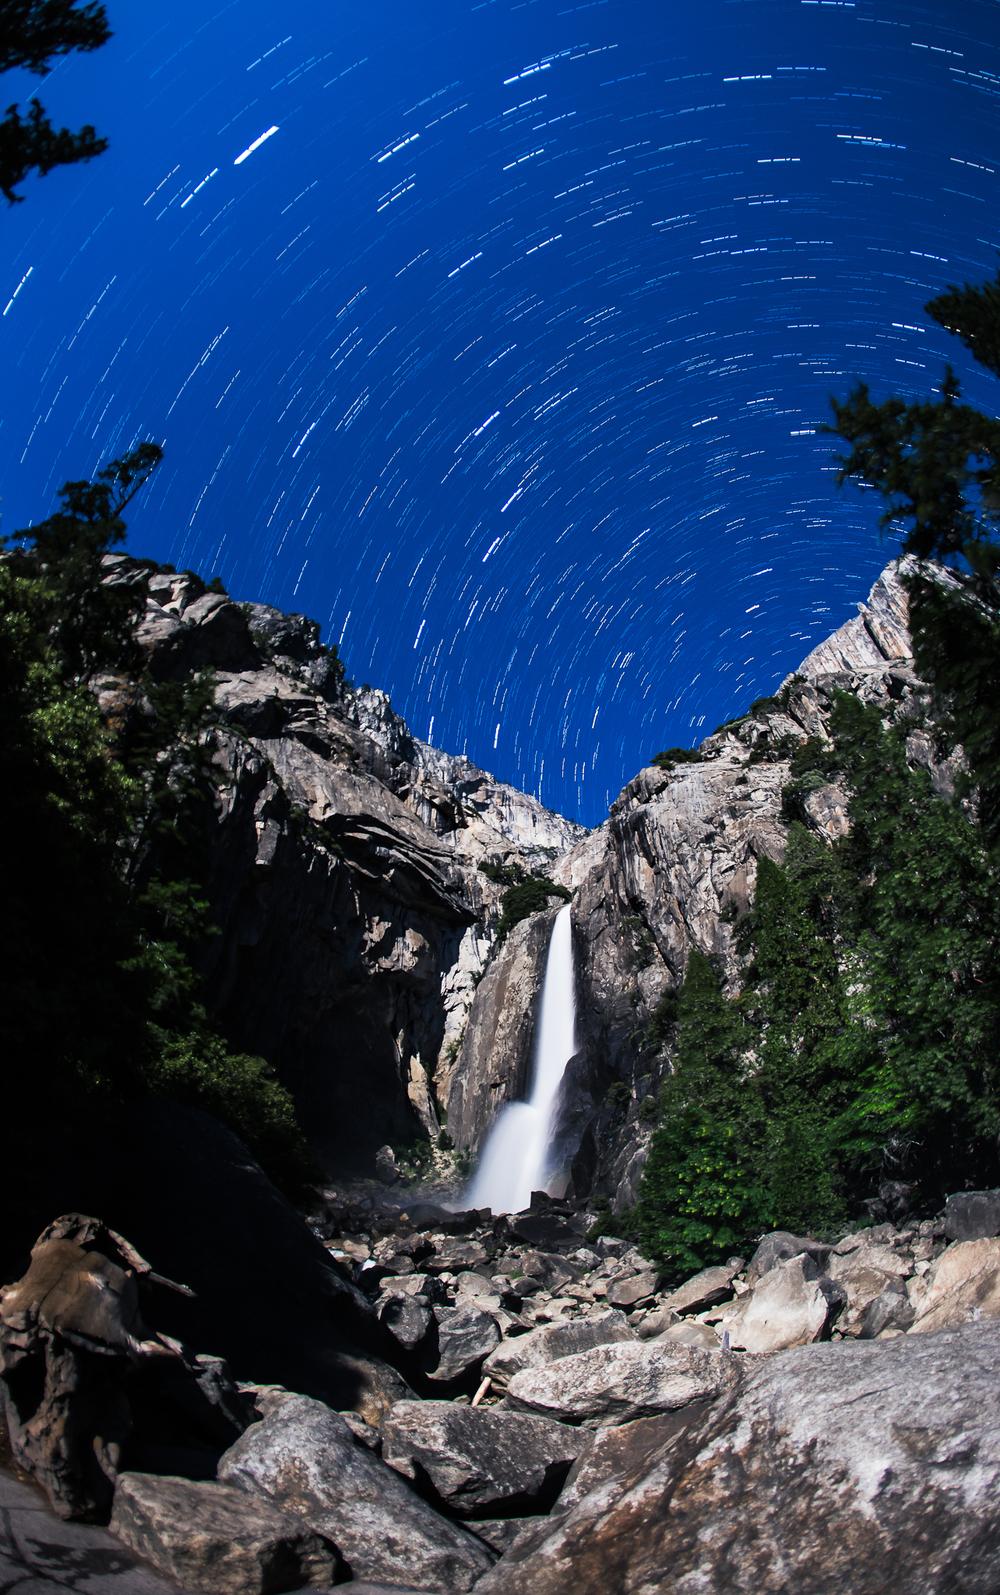 StarStaX_yosemite-9130-yosemite-9160_lighten-Edit.jpg